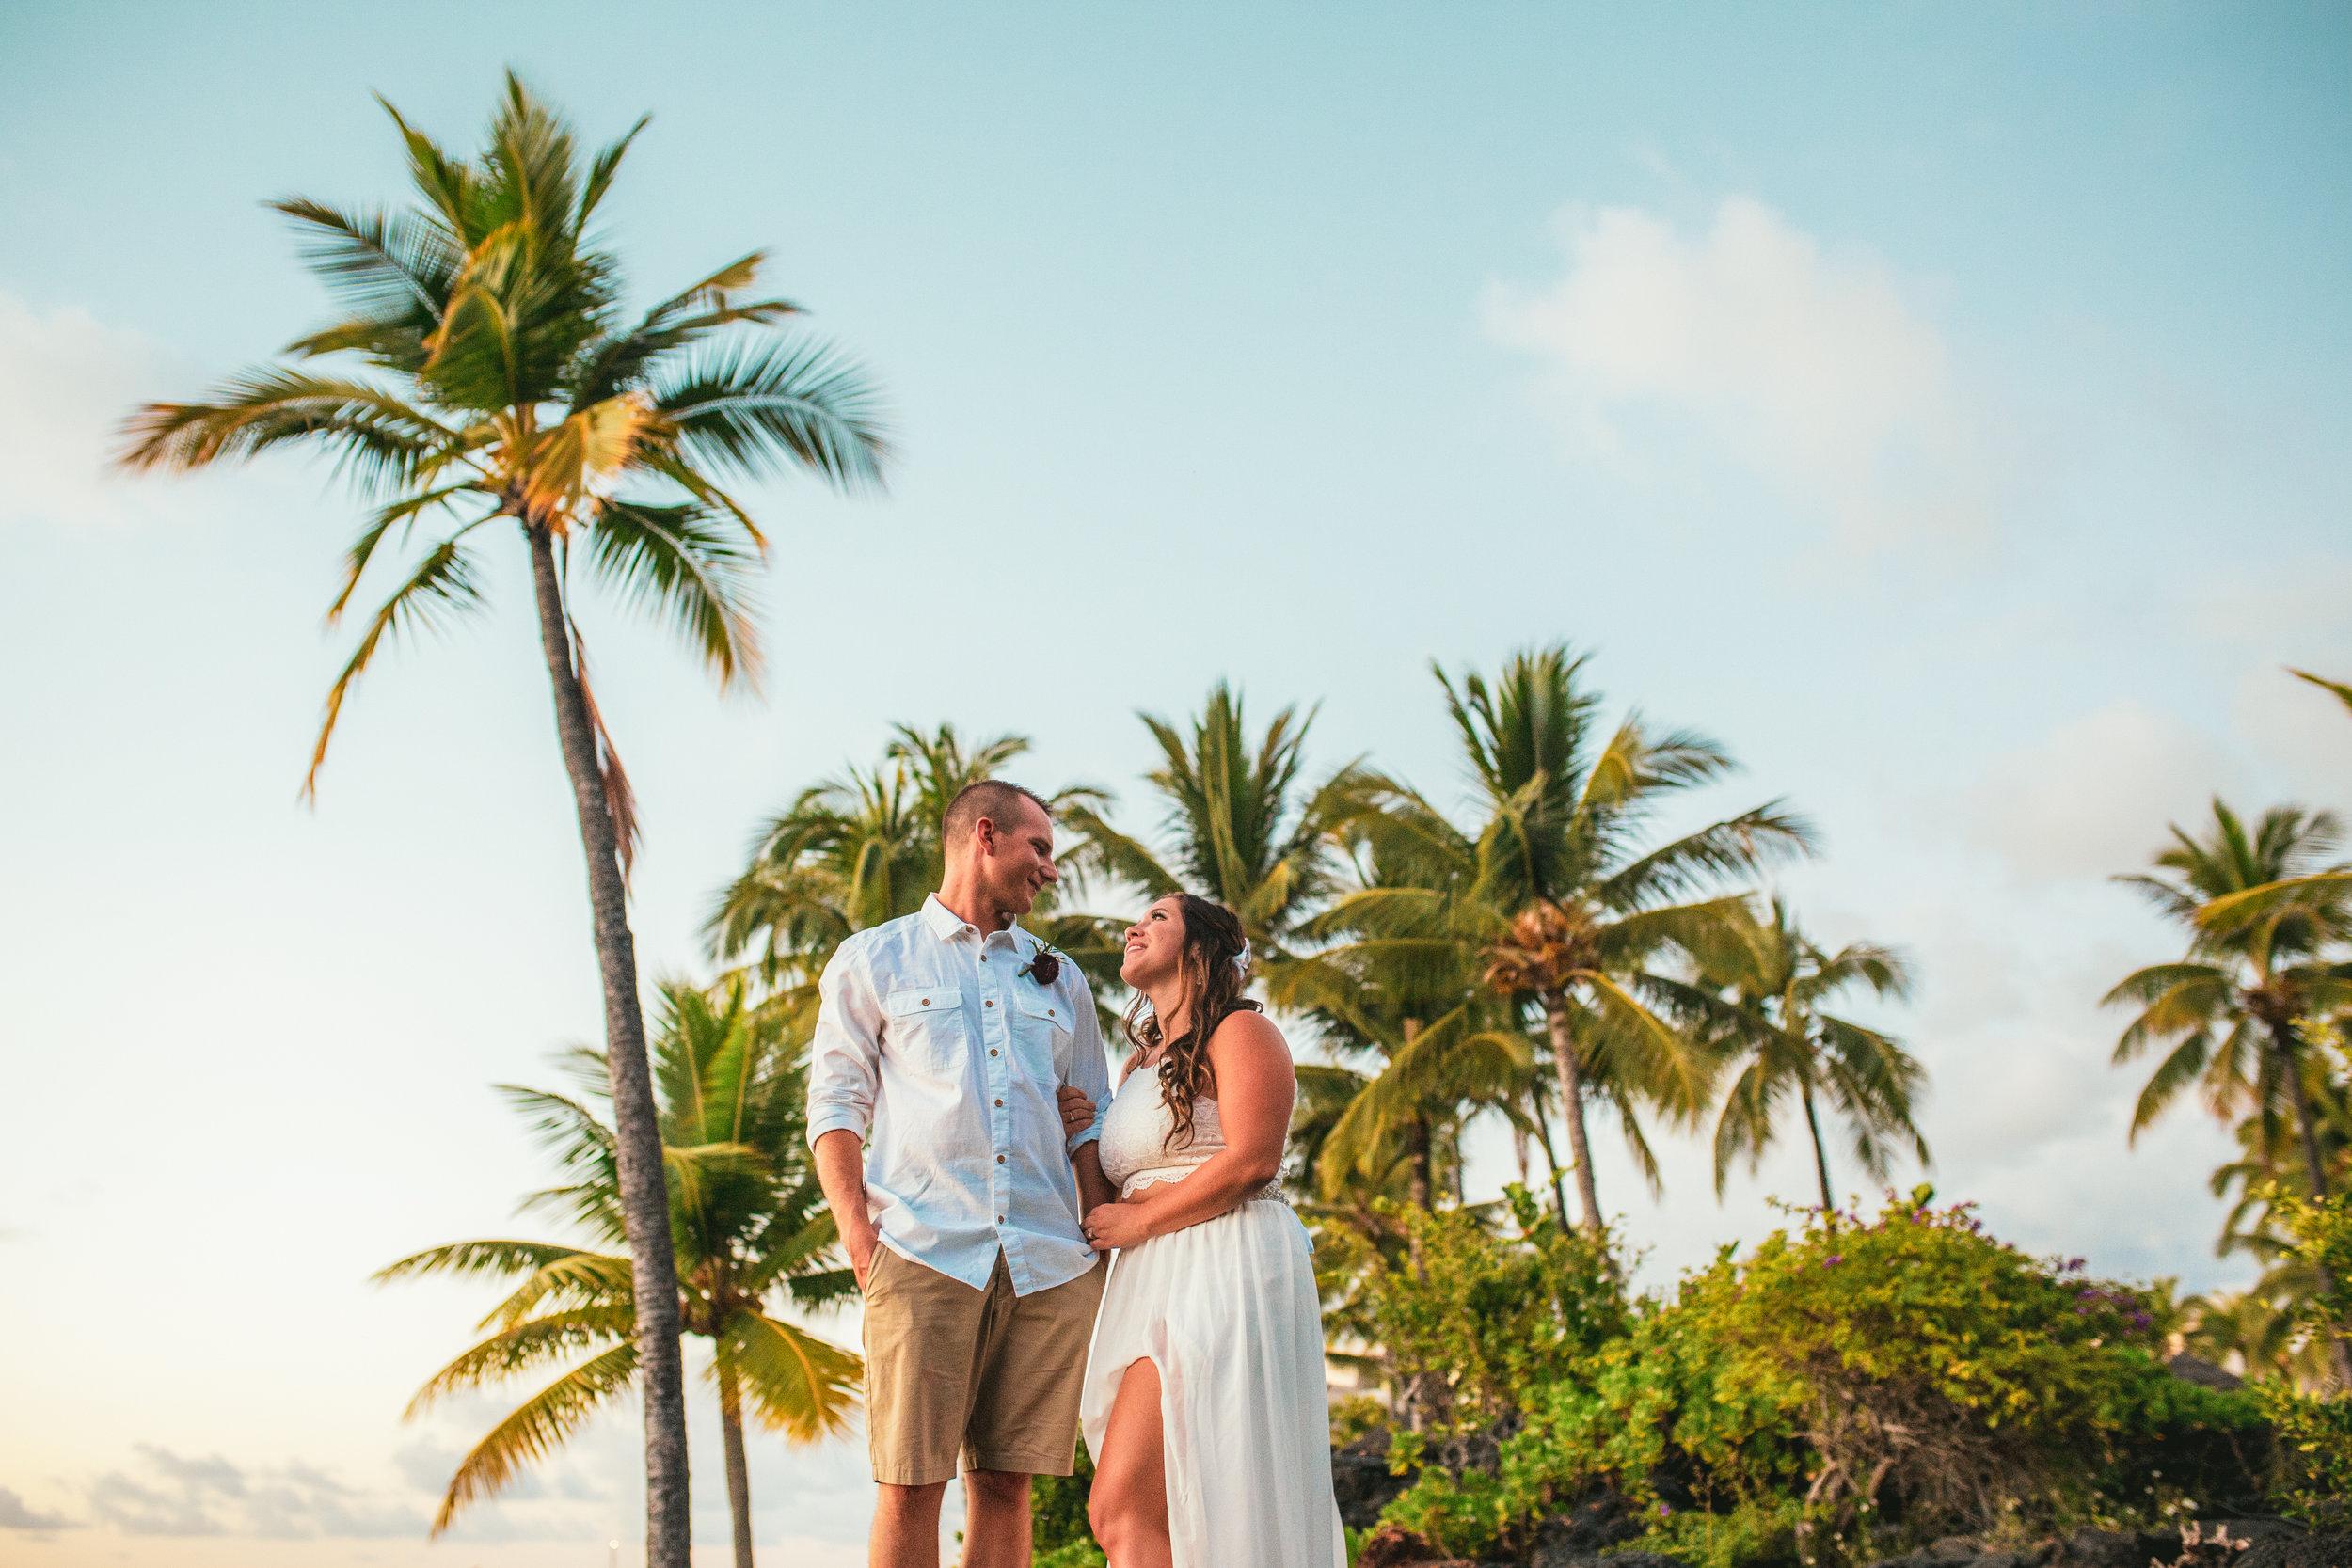 kelilina photography hawaii florida destination wedding photographer-30.jpg